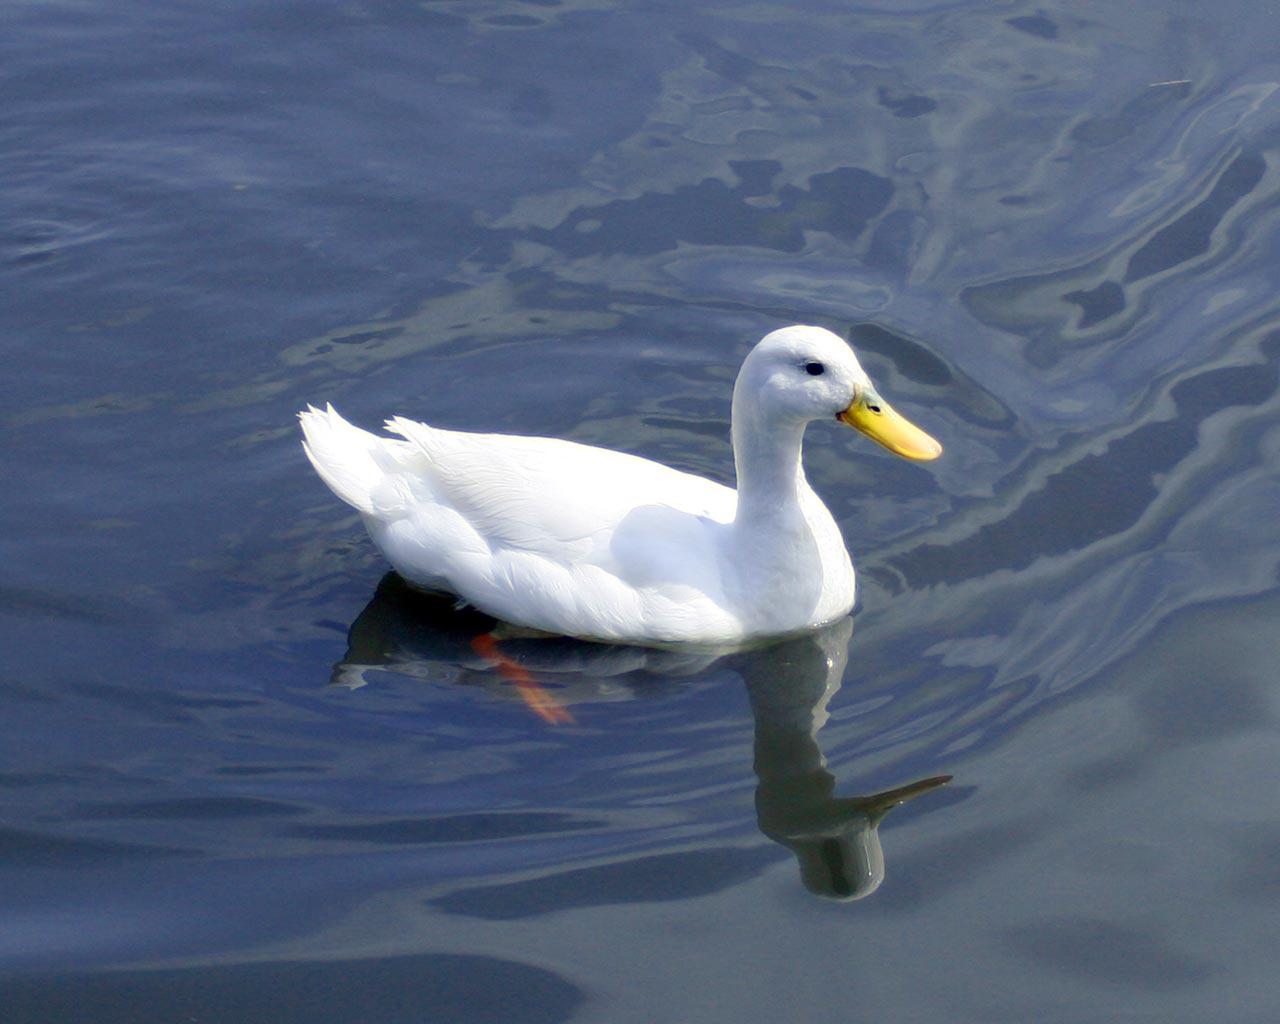 http://3.bp.blogspot.com/-ipTQWF0oIDo/Tu85NTt5fBI/AAAAAAAAAXU/9thK-vFBKJg/s1600/Bright-White-Duck.jpg